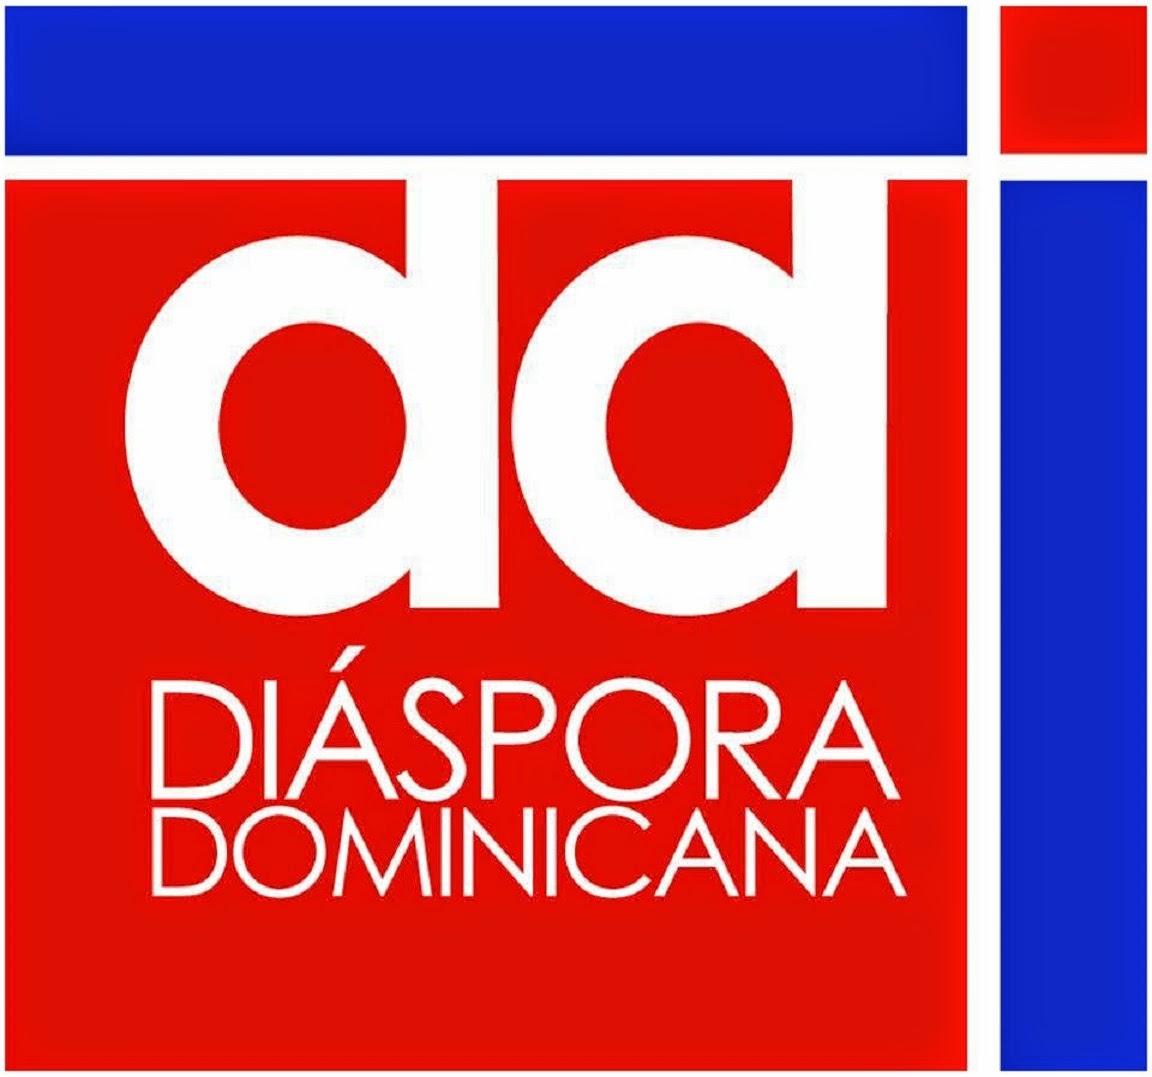 Diaspora Dominicana